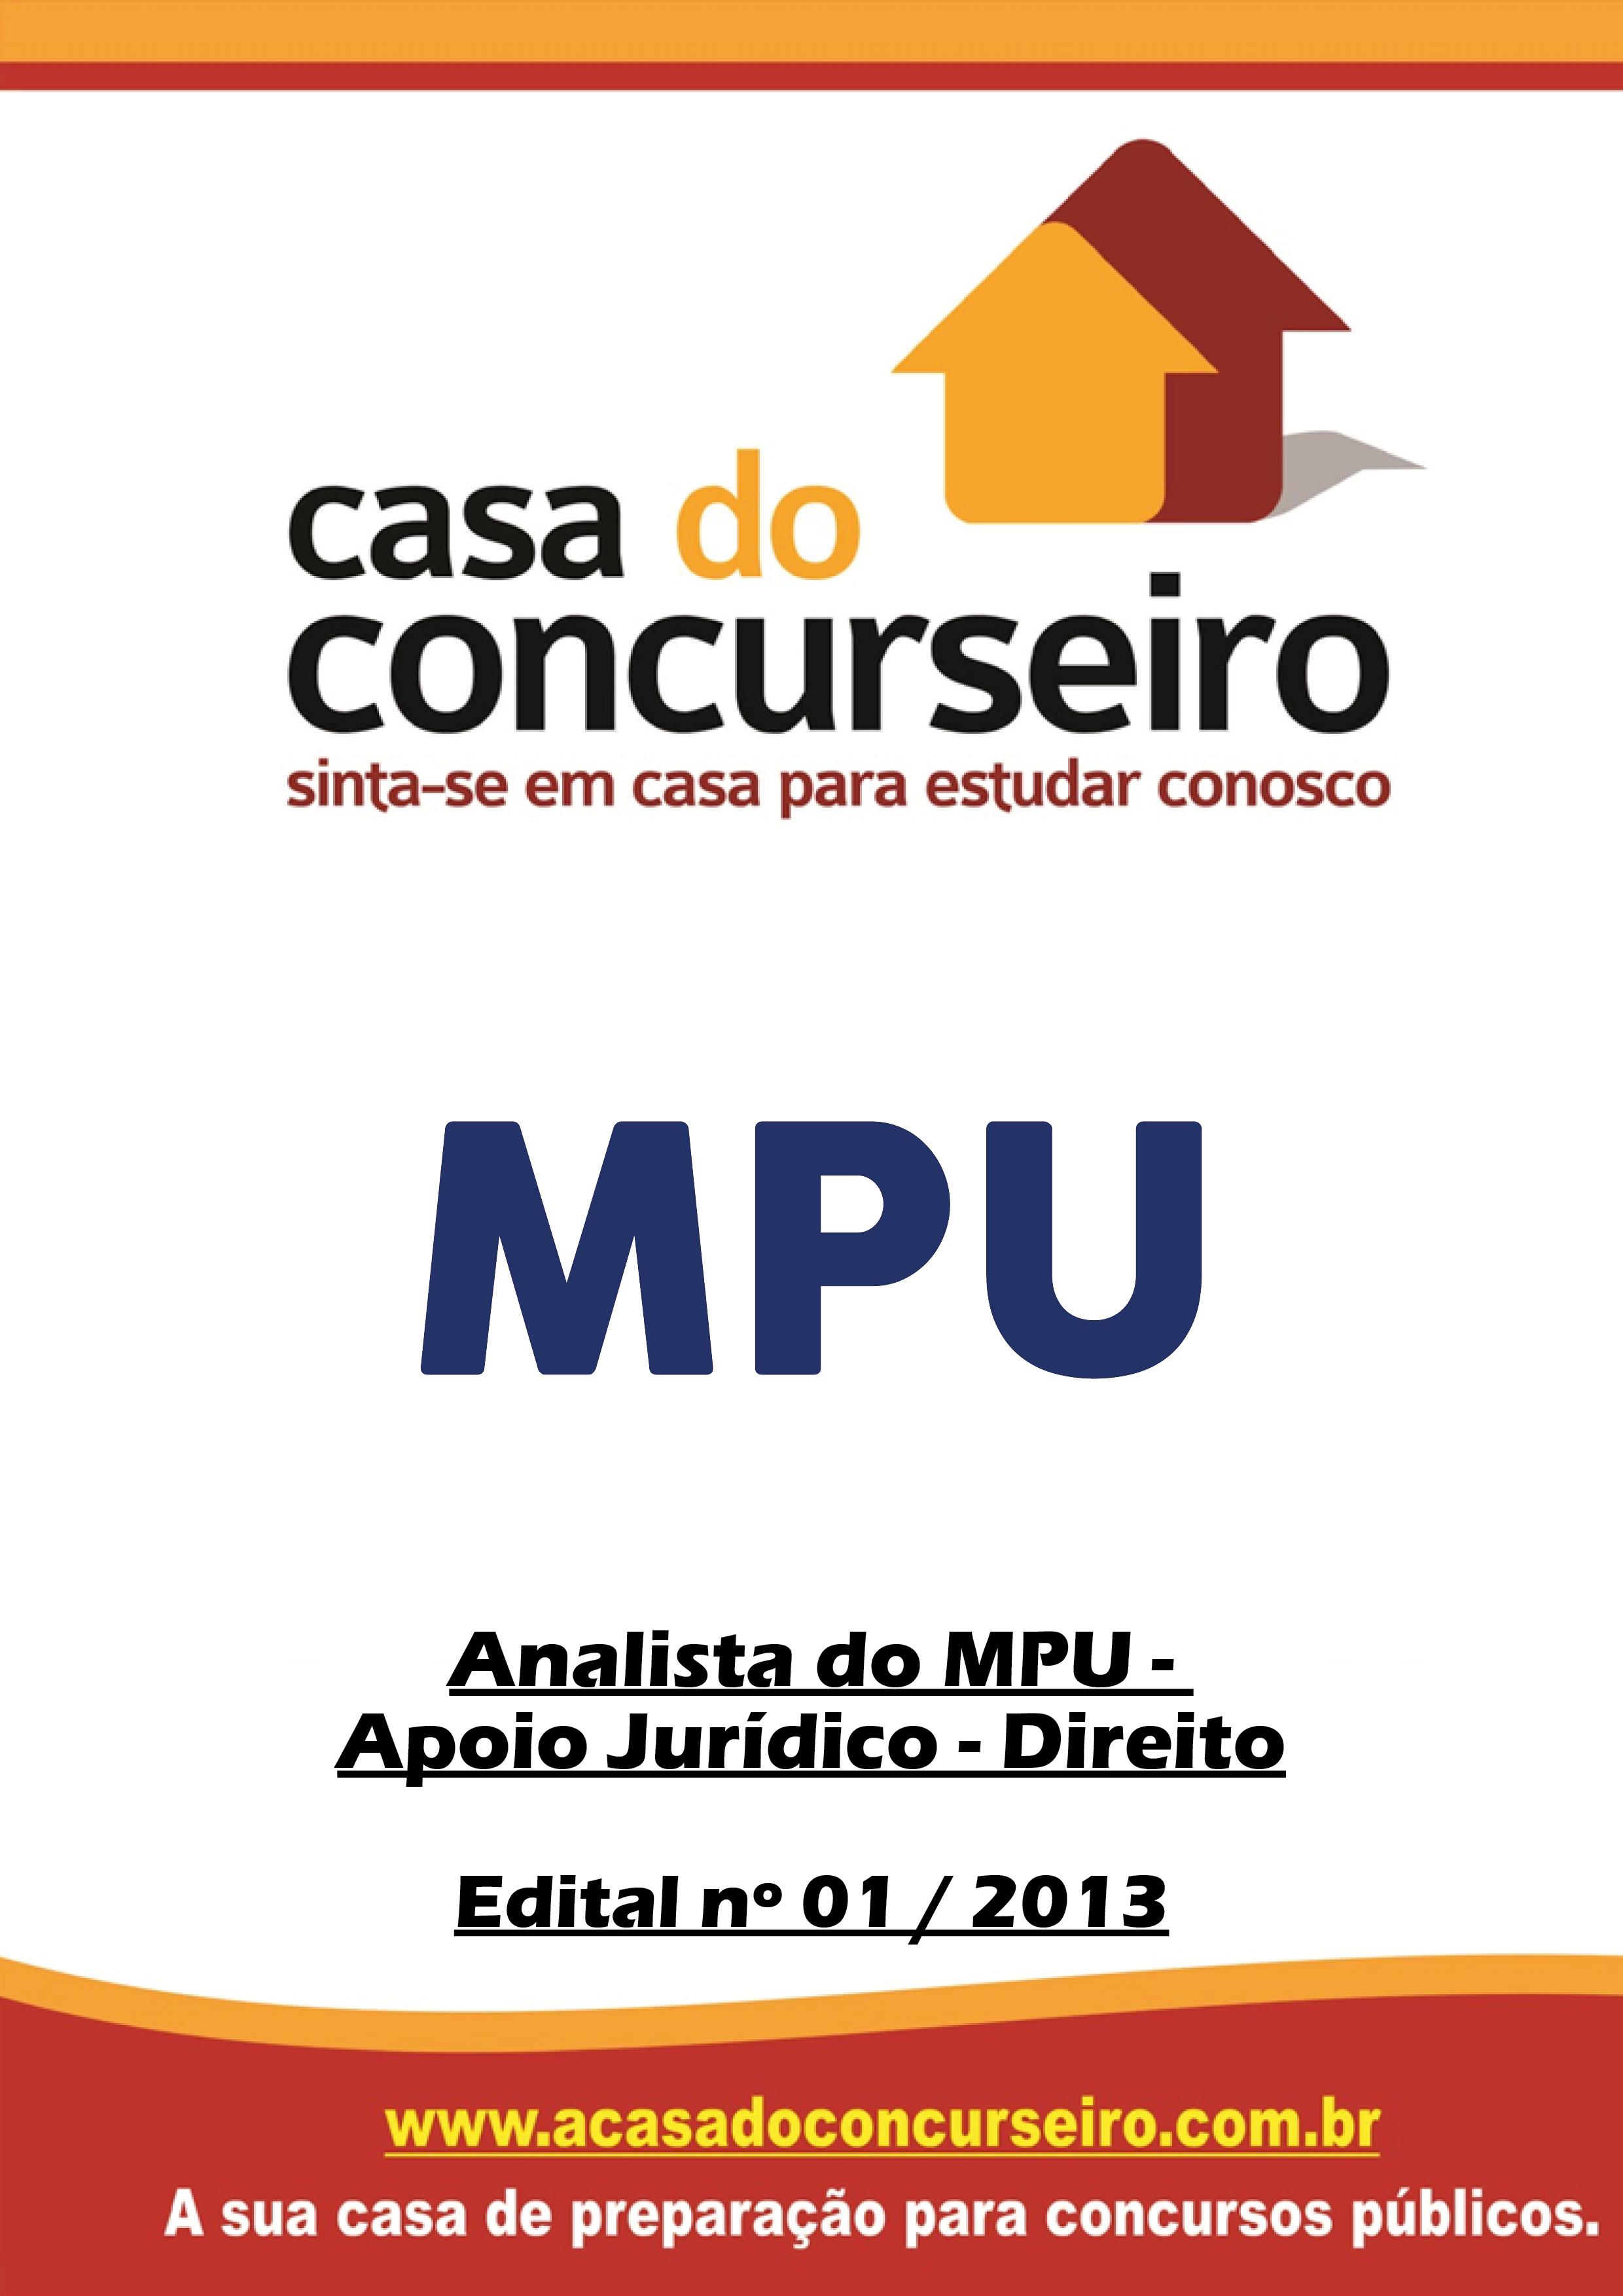 Apostila preparatória para concurso MPU - Analista Jurídico Ministério Público Federal - Edital nº 01/2013